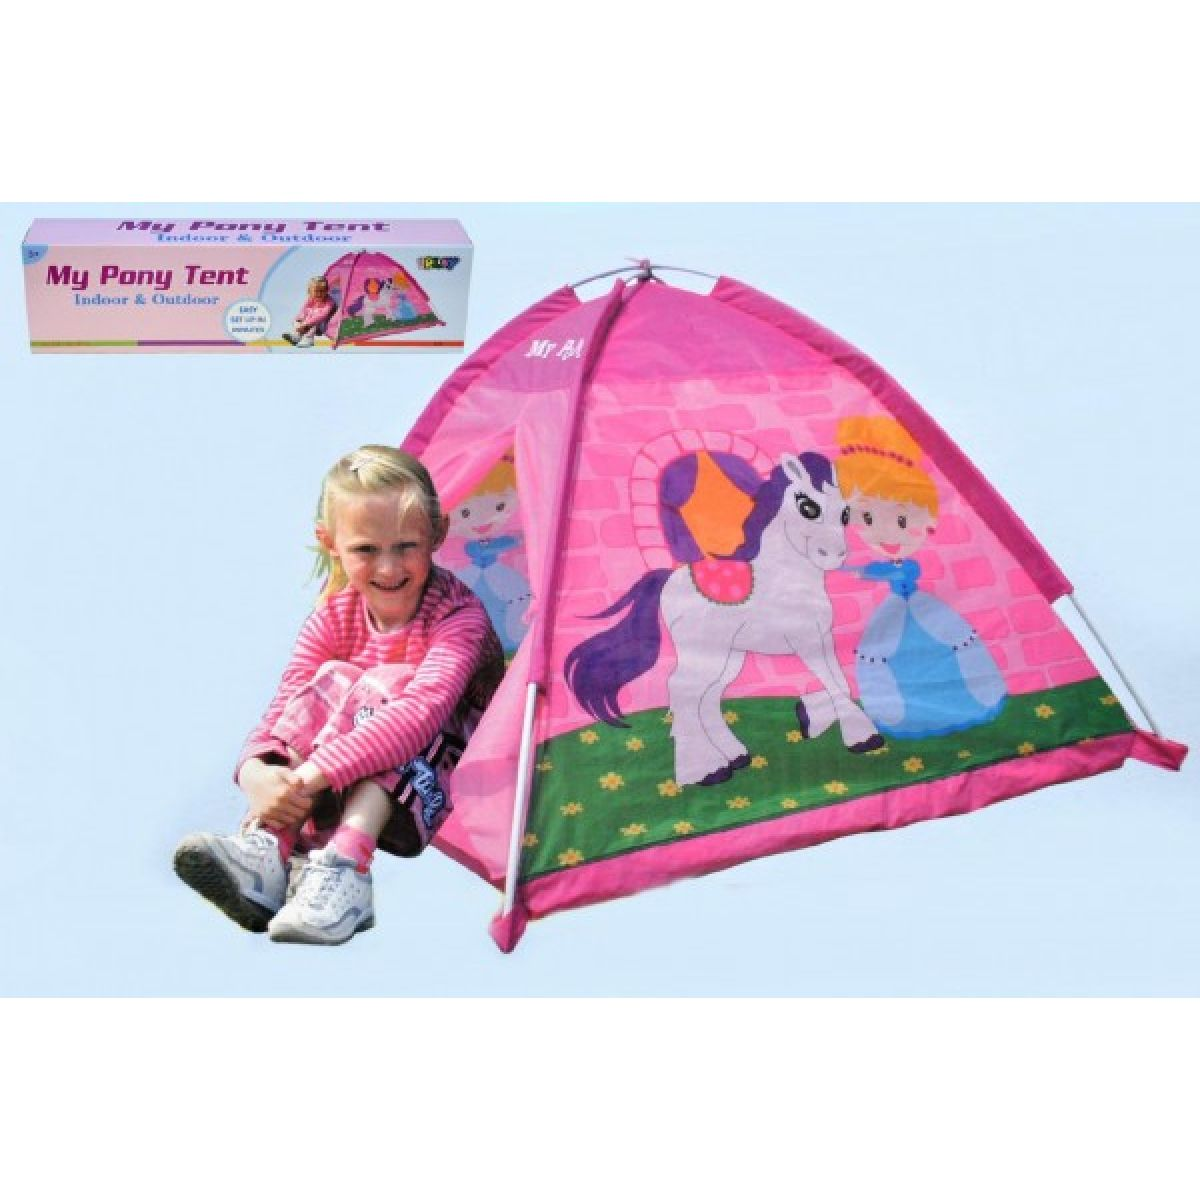 Stan pro děti s koníkem 112x112x94cm